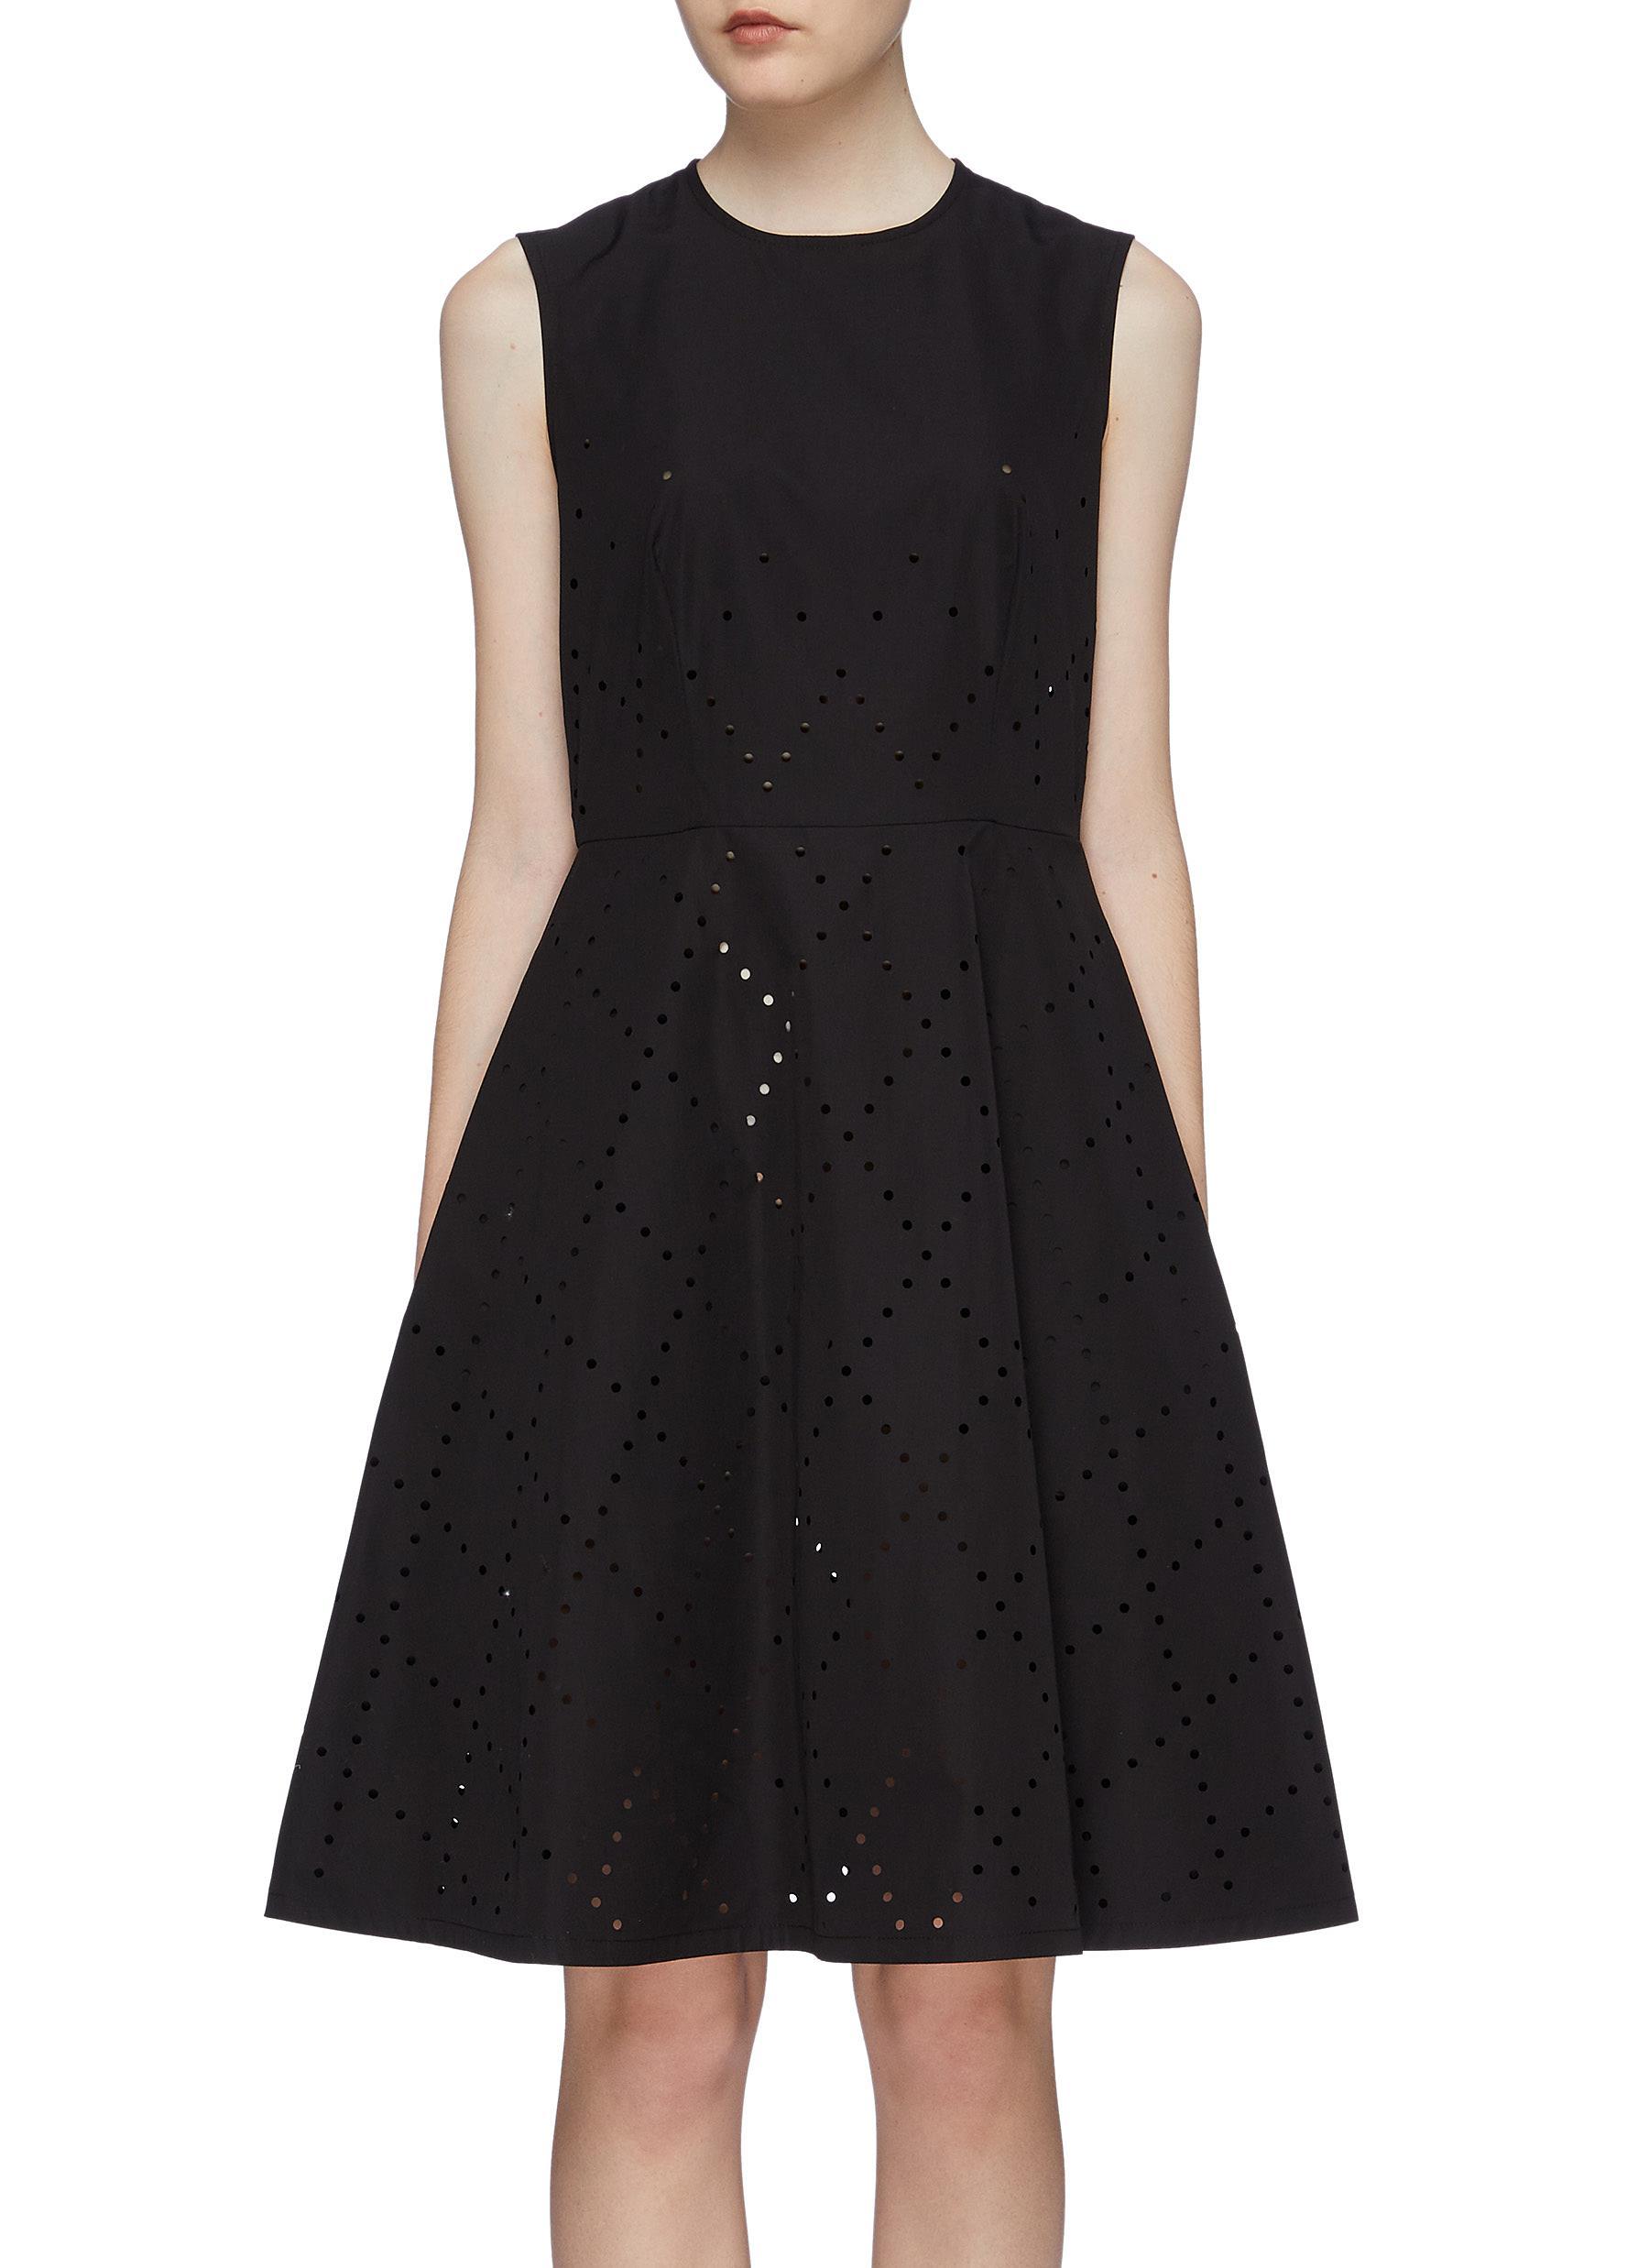 x Noir Kei Ninomiya geometric perforated sleeveless dress by Moncler Genius